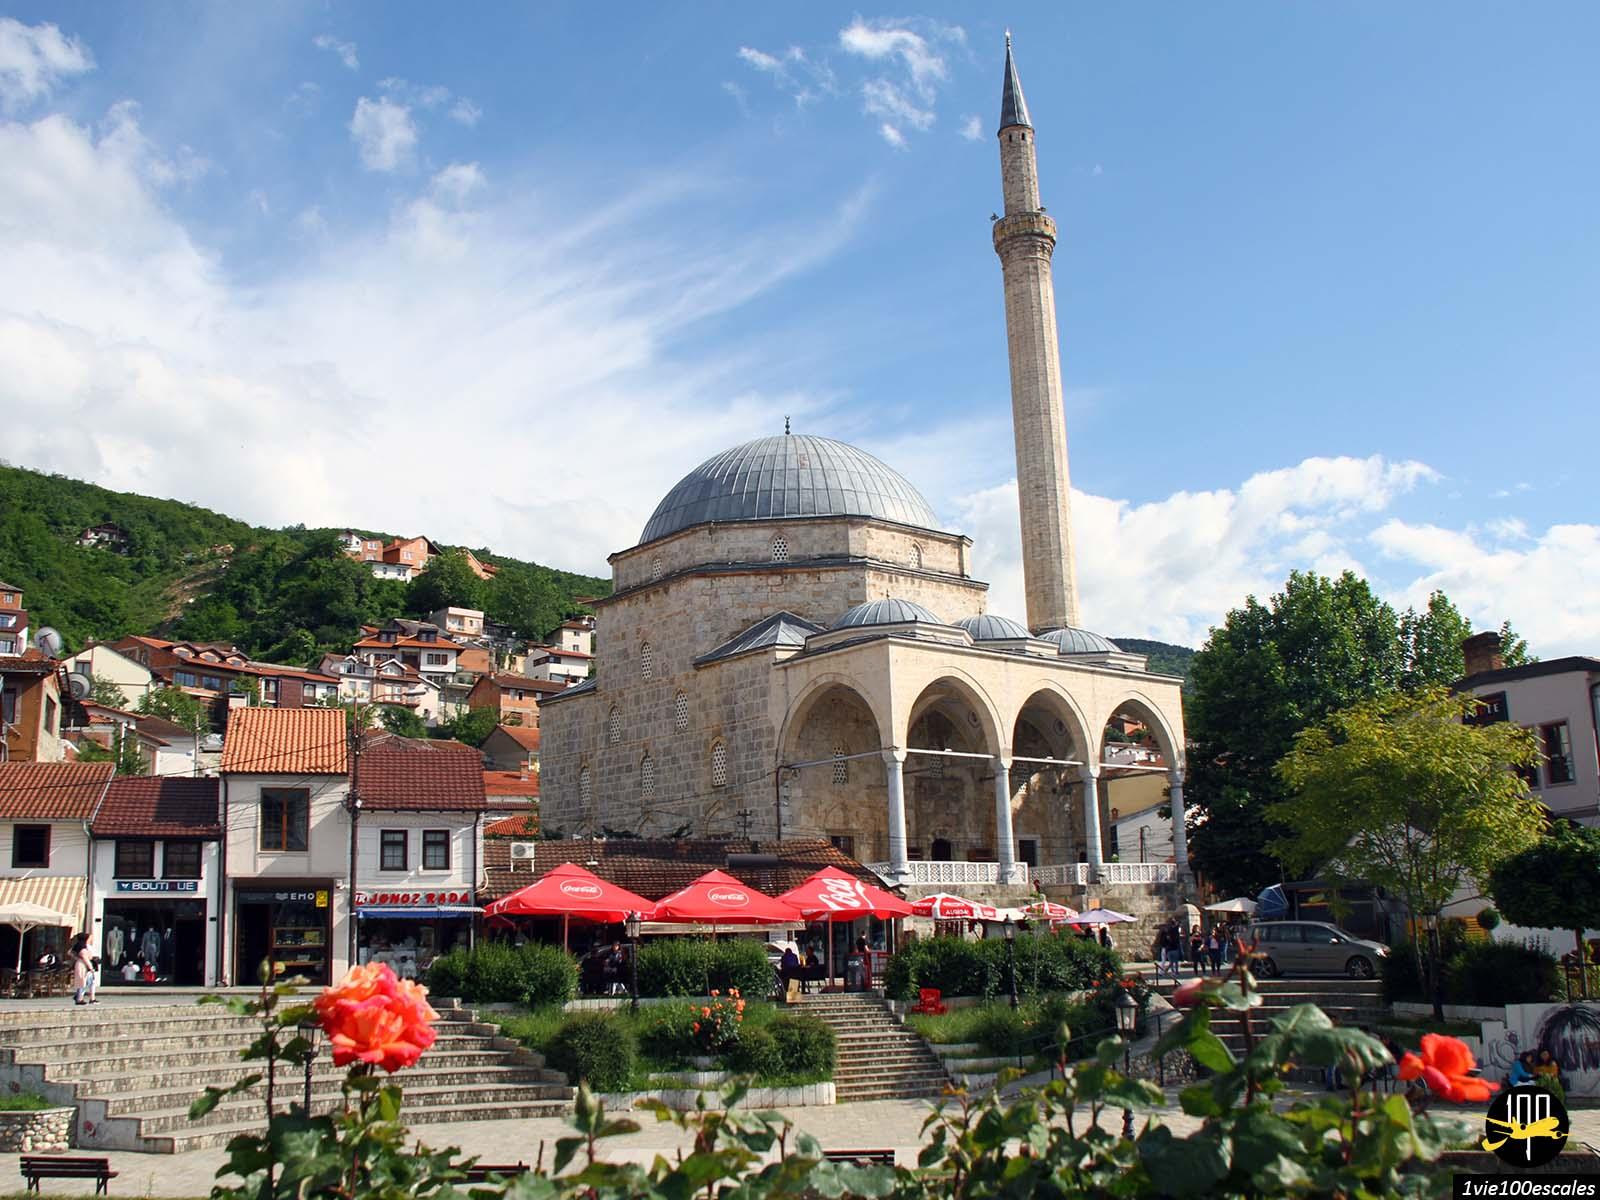 Escale #127 Prizren